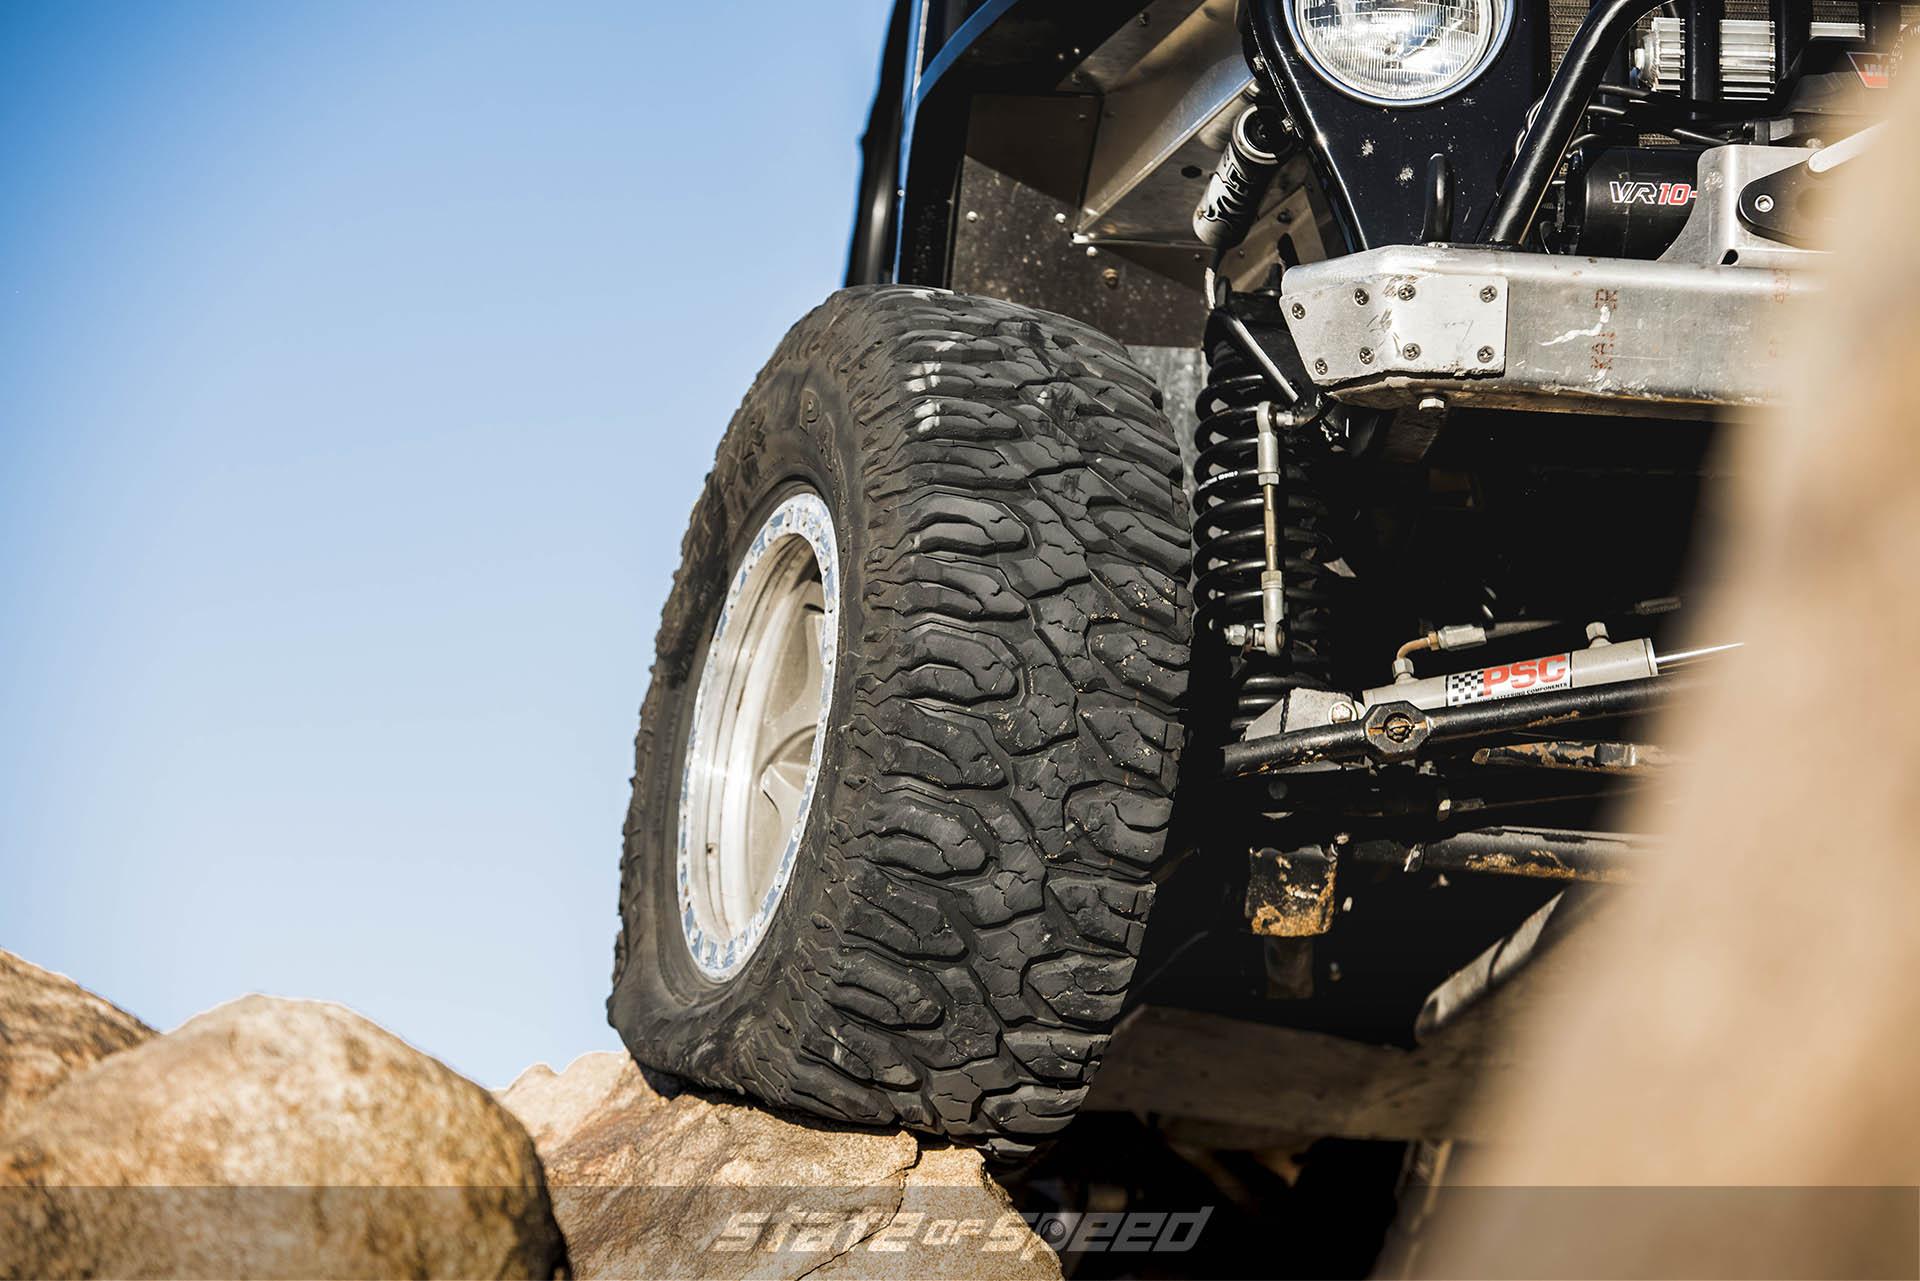 Milestar Patagonia M/Ts on modified Jeep TJ Wrangler